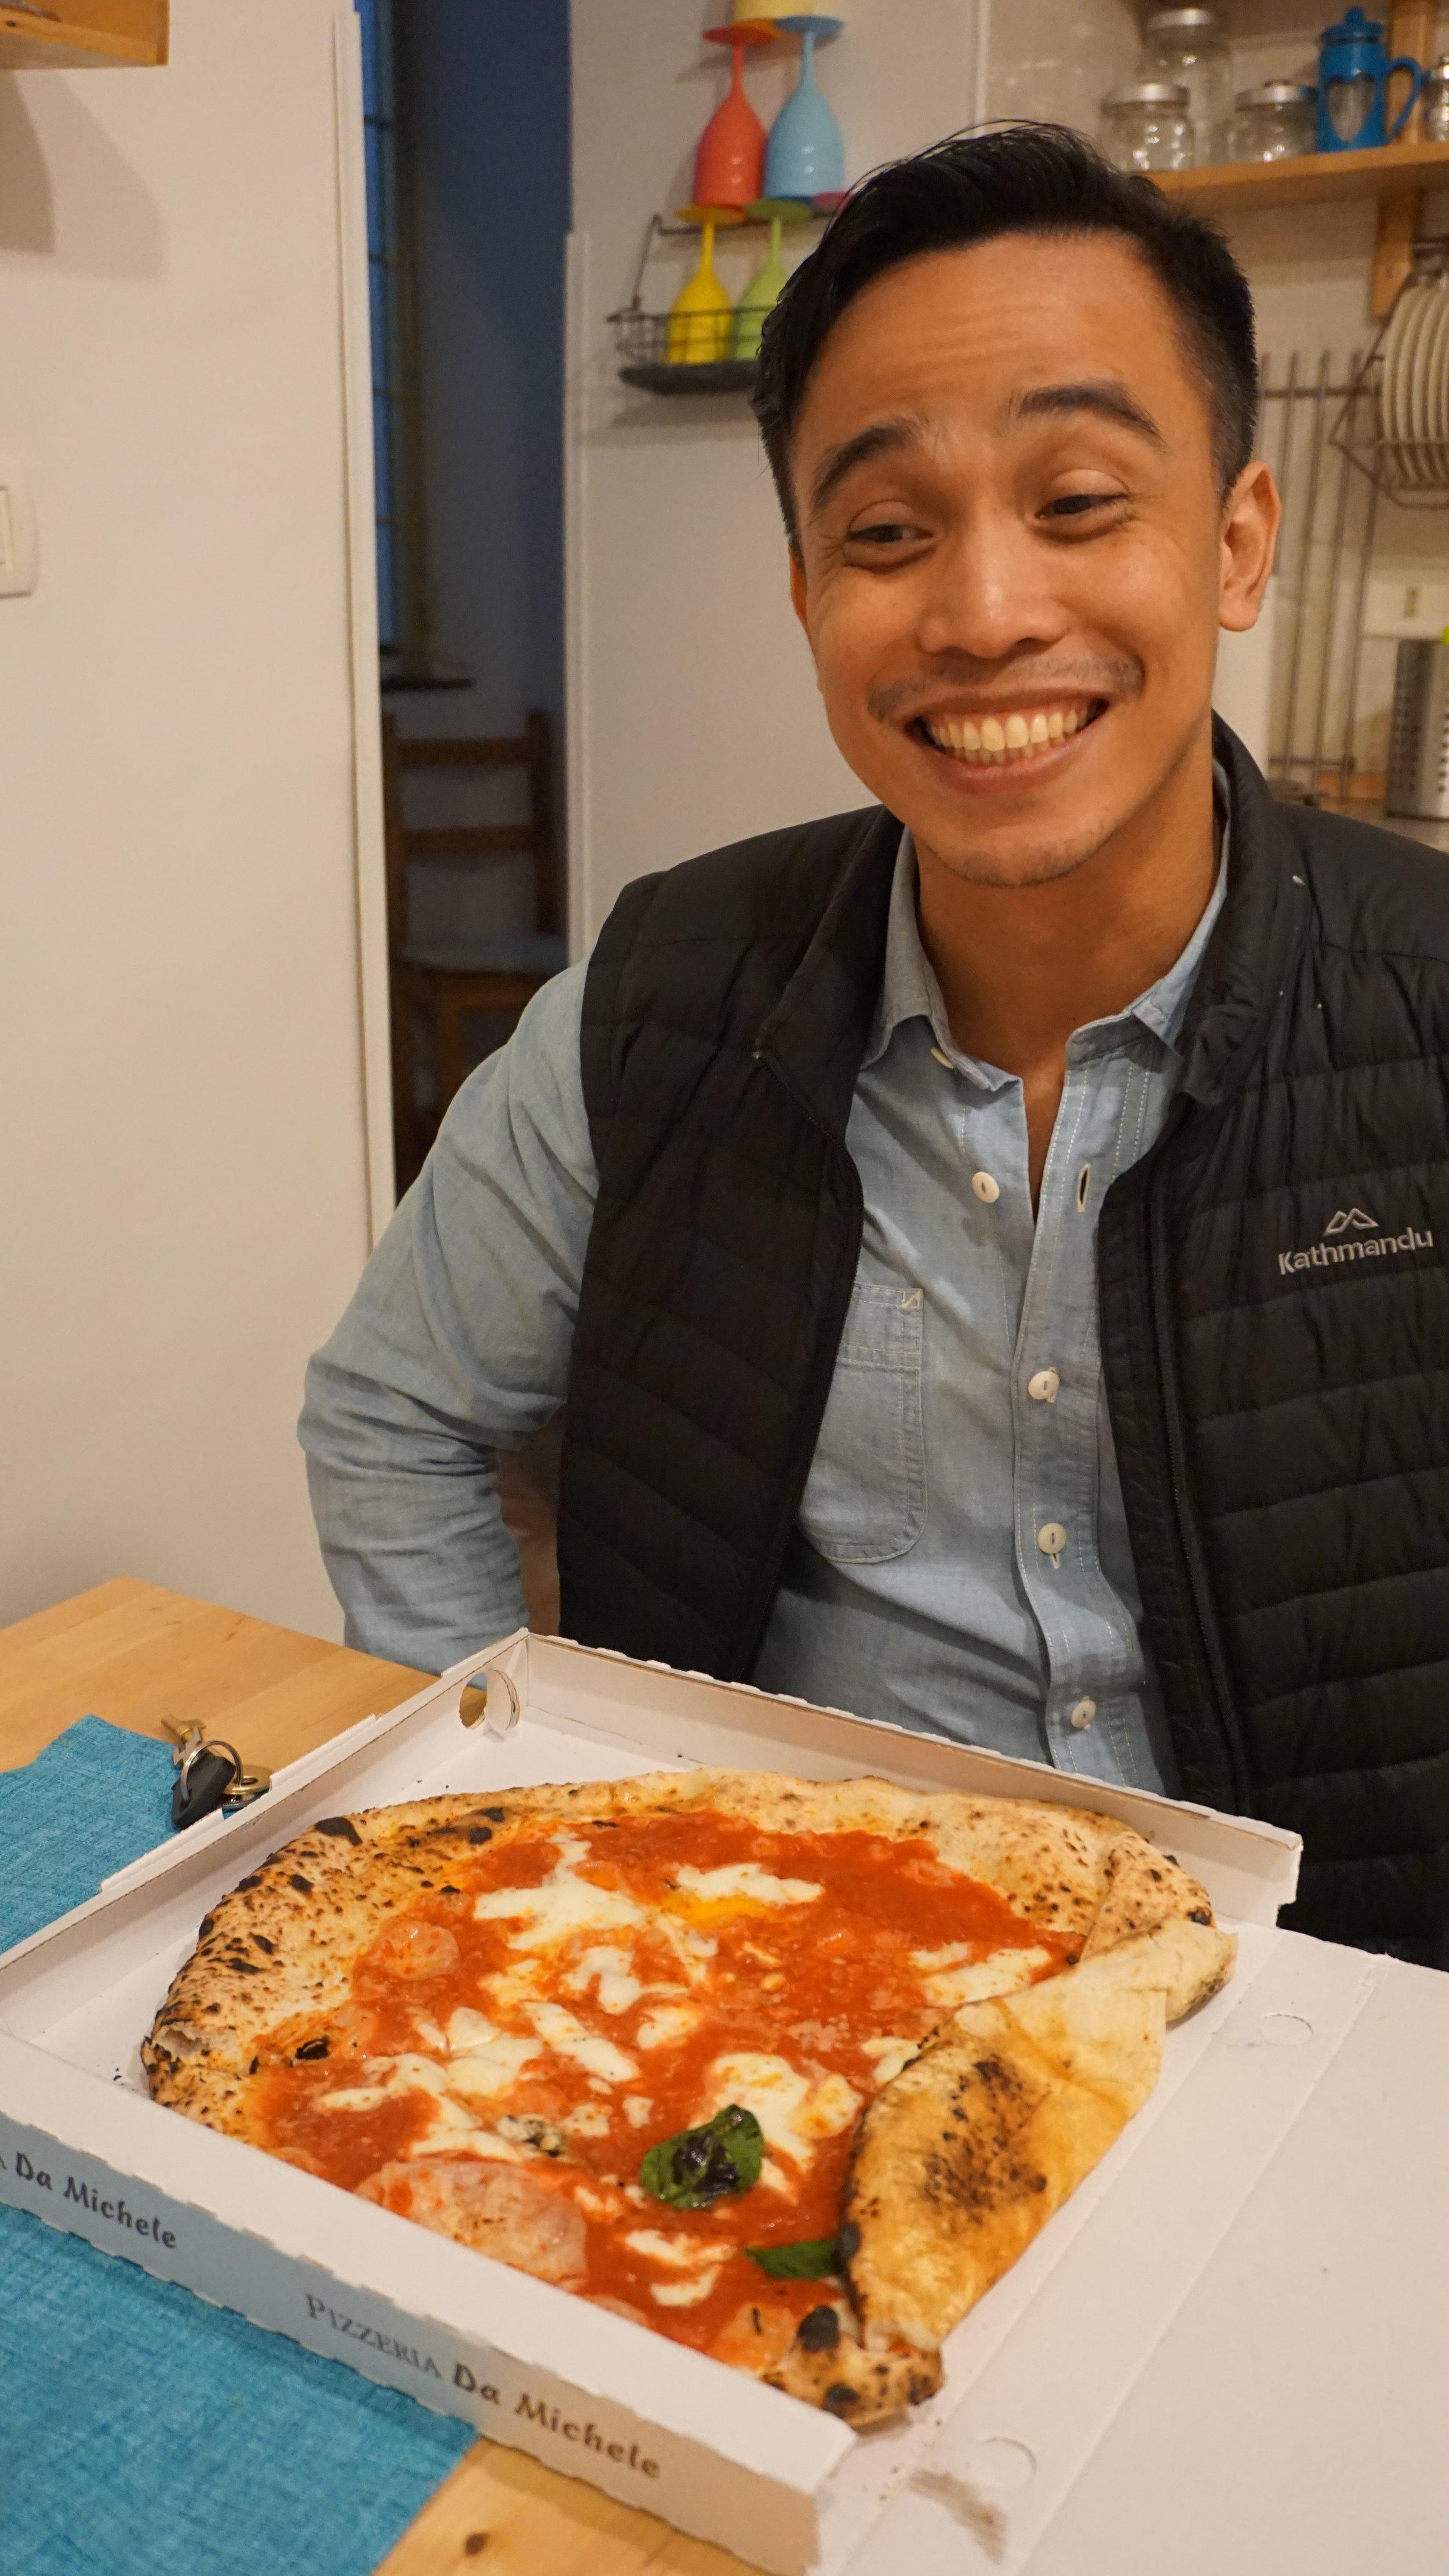 Pizzaboy so happy!!